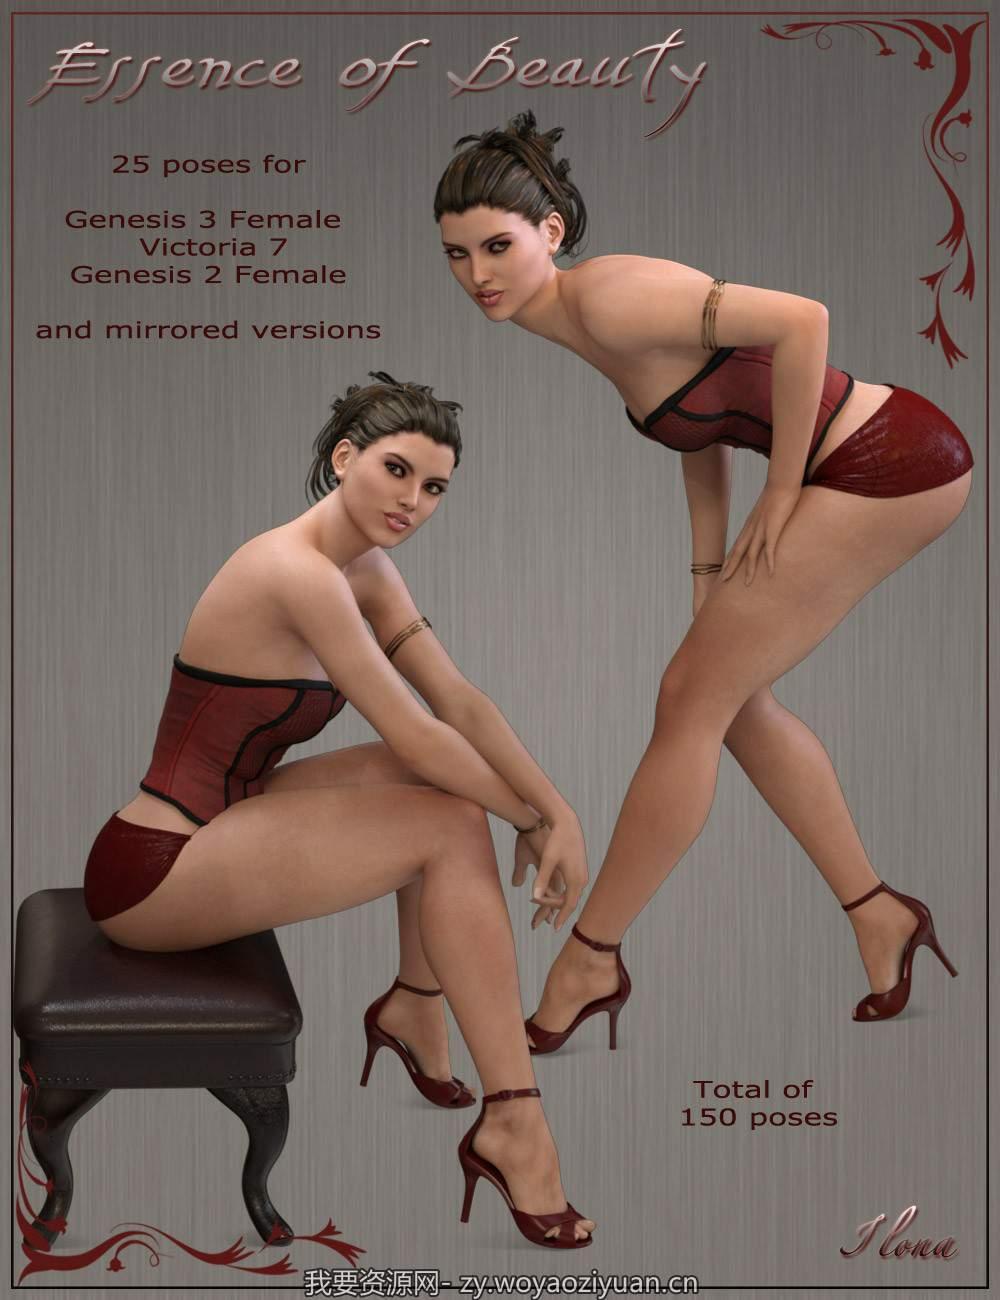 Essence of Beauty Poses G2F G3F